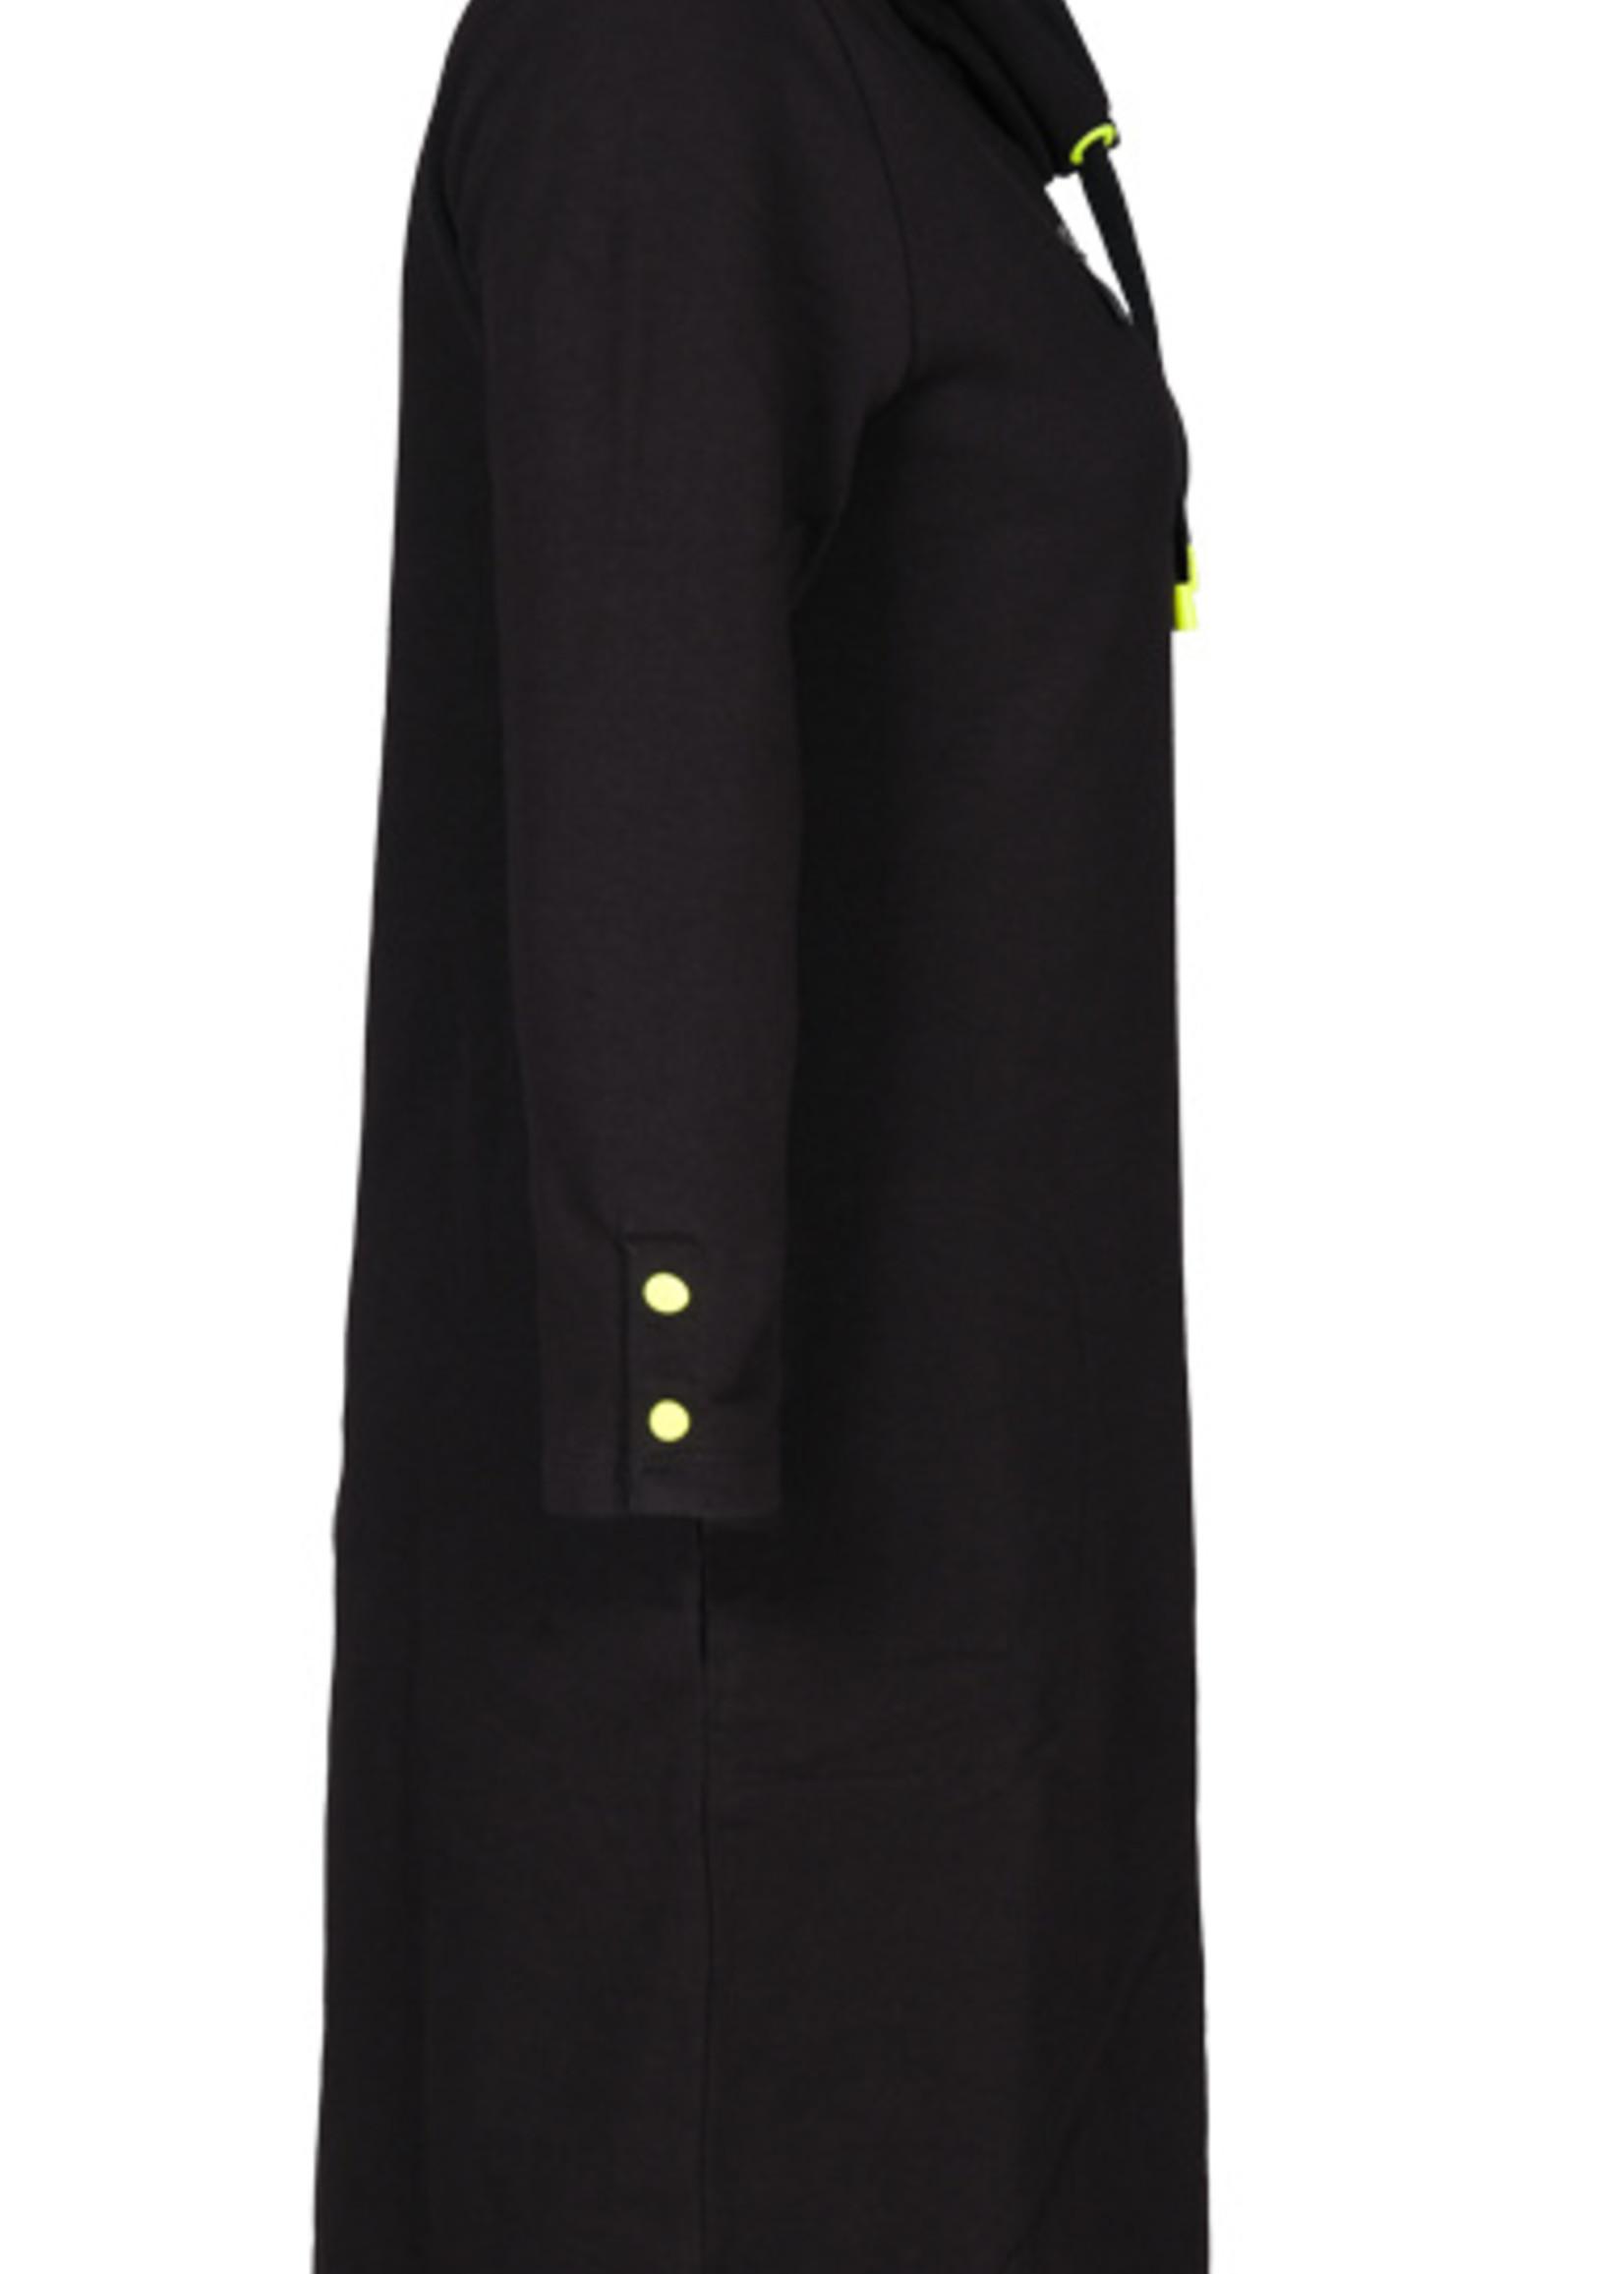 Dolcezza Dolcezza Zipper Dress